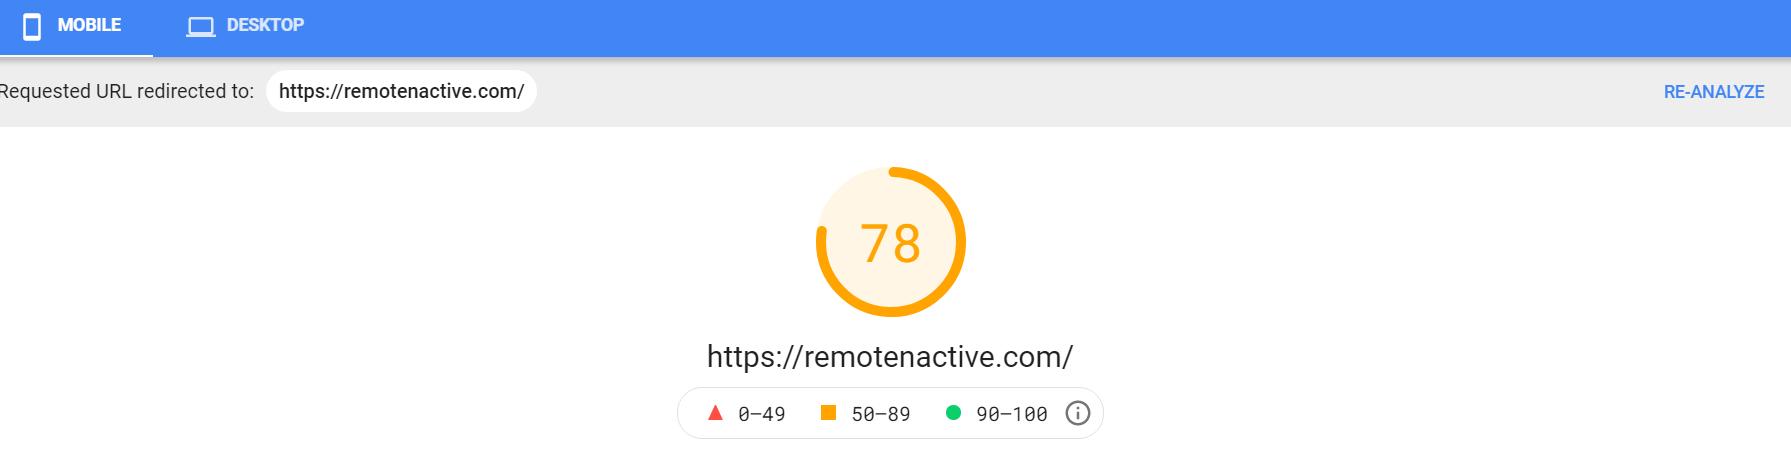 https://i.ibb.co/PFWjNS0/remotenactive-mobile.png